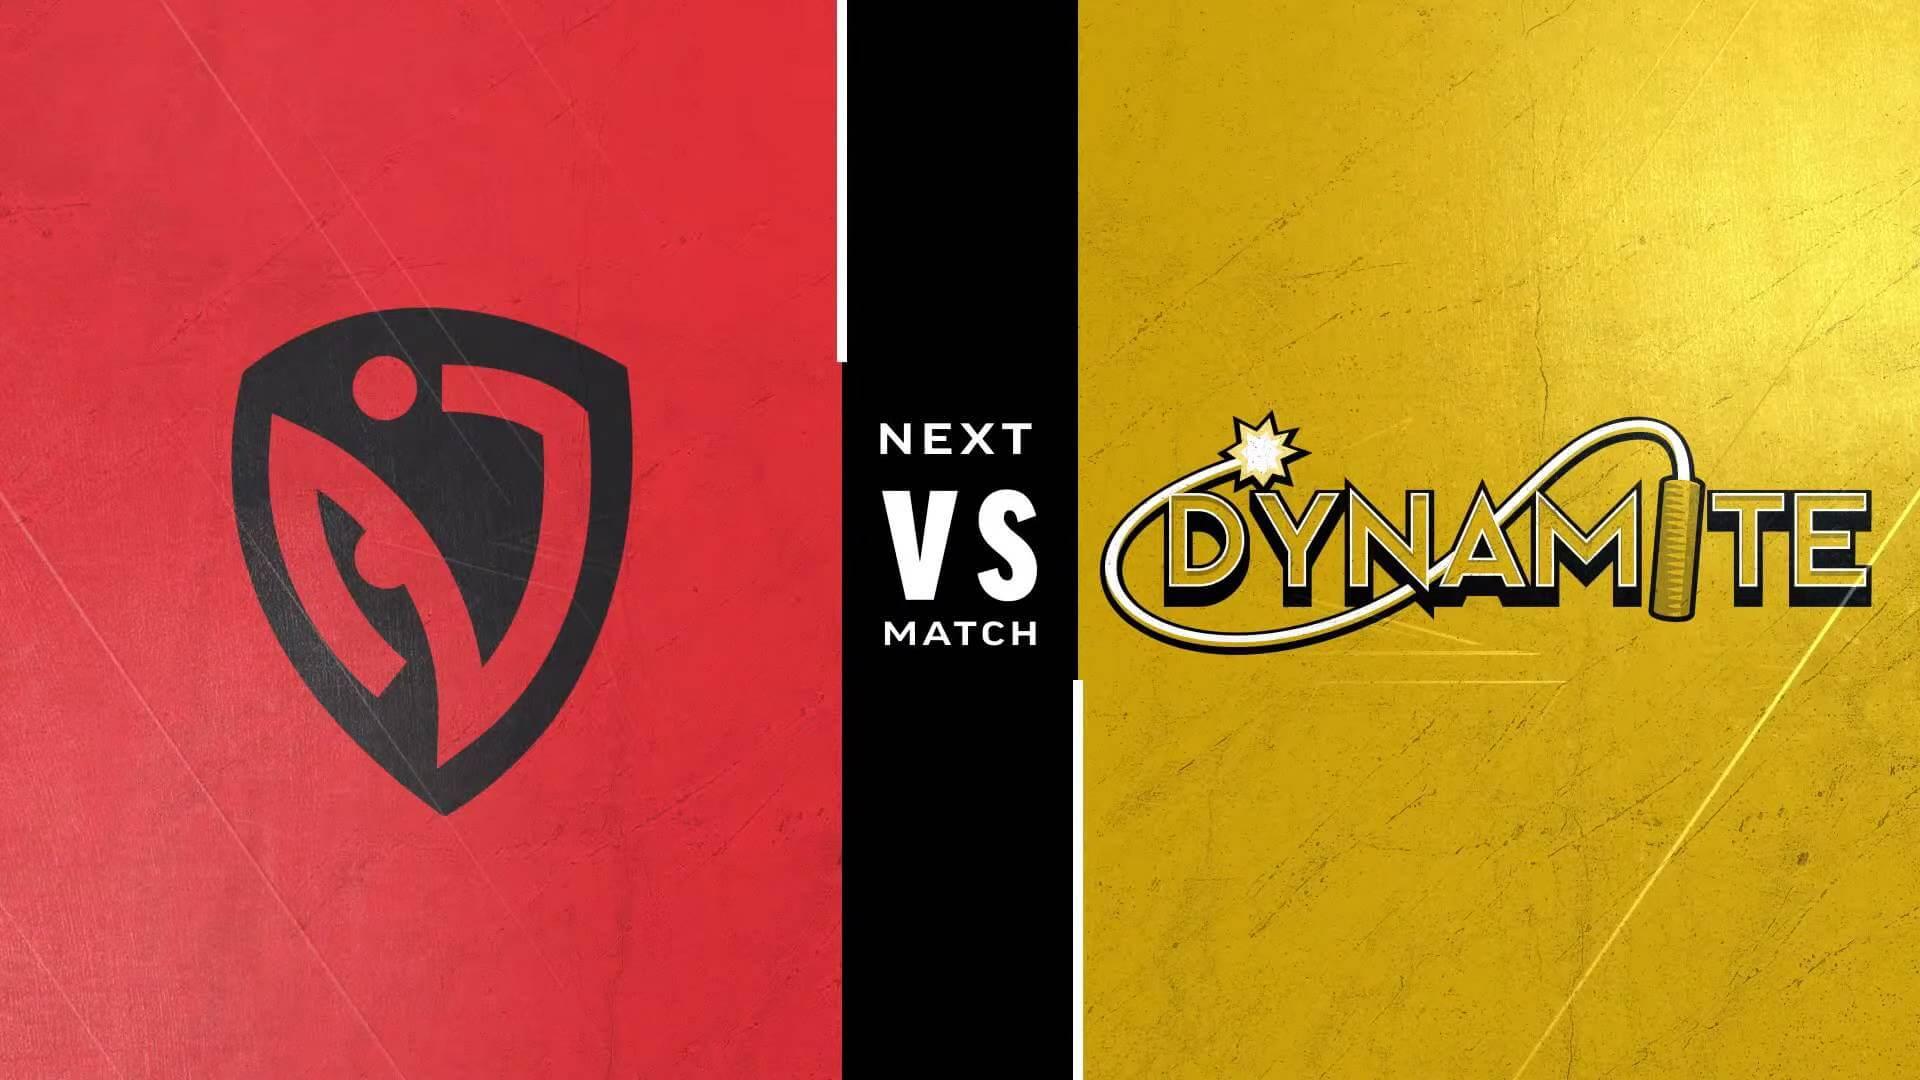 Street Fighter Leaguer Pro-US - NASR vs Dynamite team logos